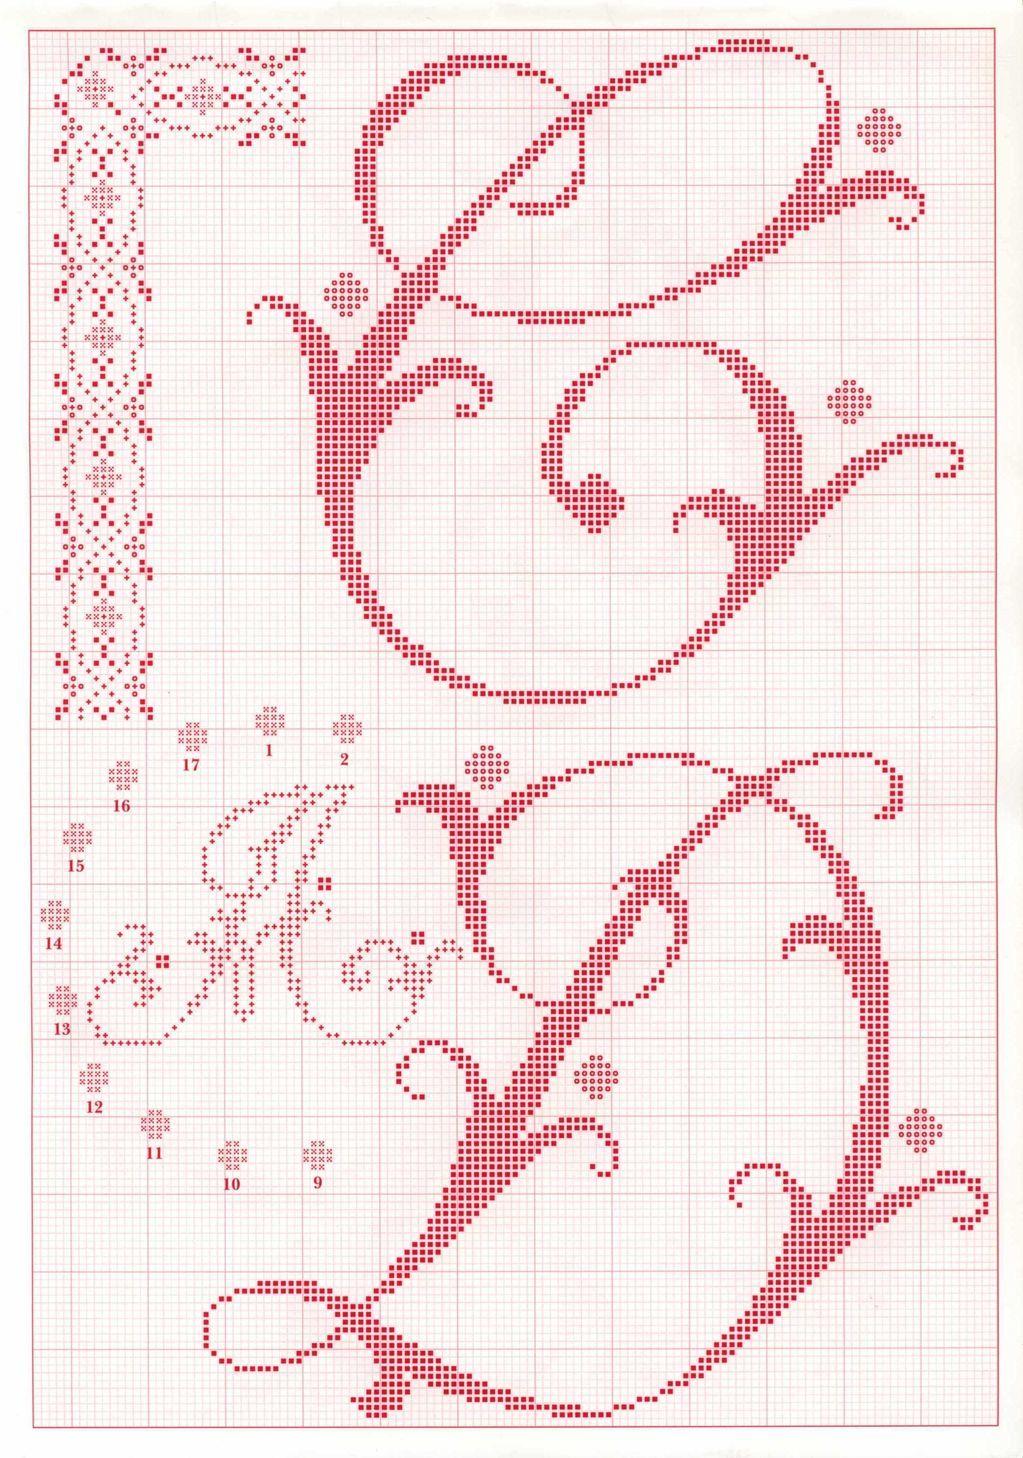 Pin de Maritza Sasaki en Crochet : Filet doilies (Carpeta en gancho ...